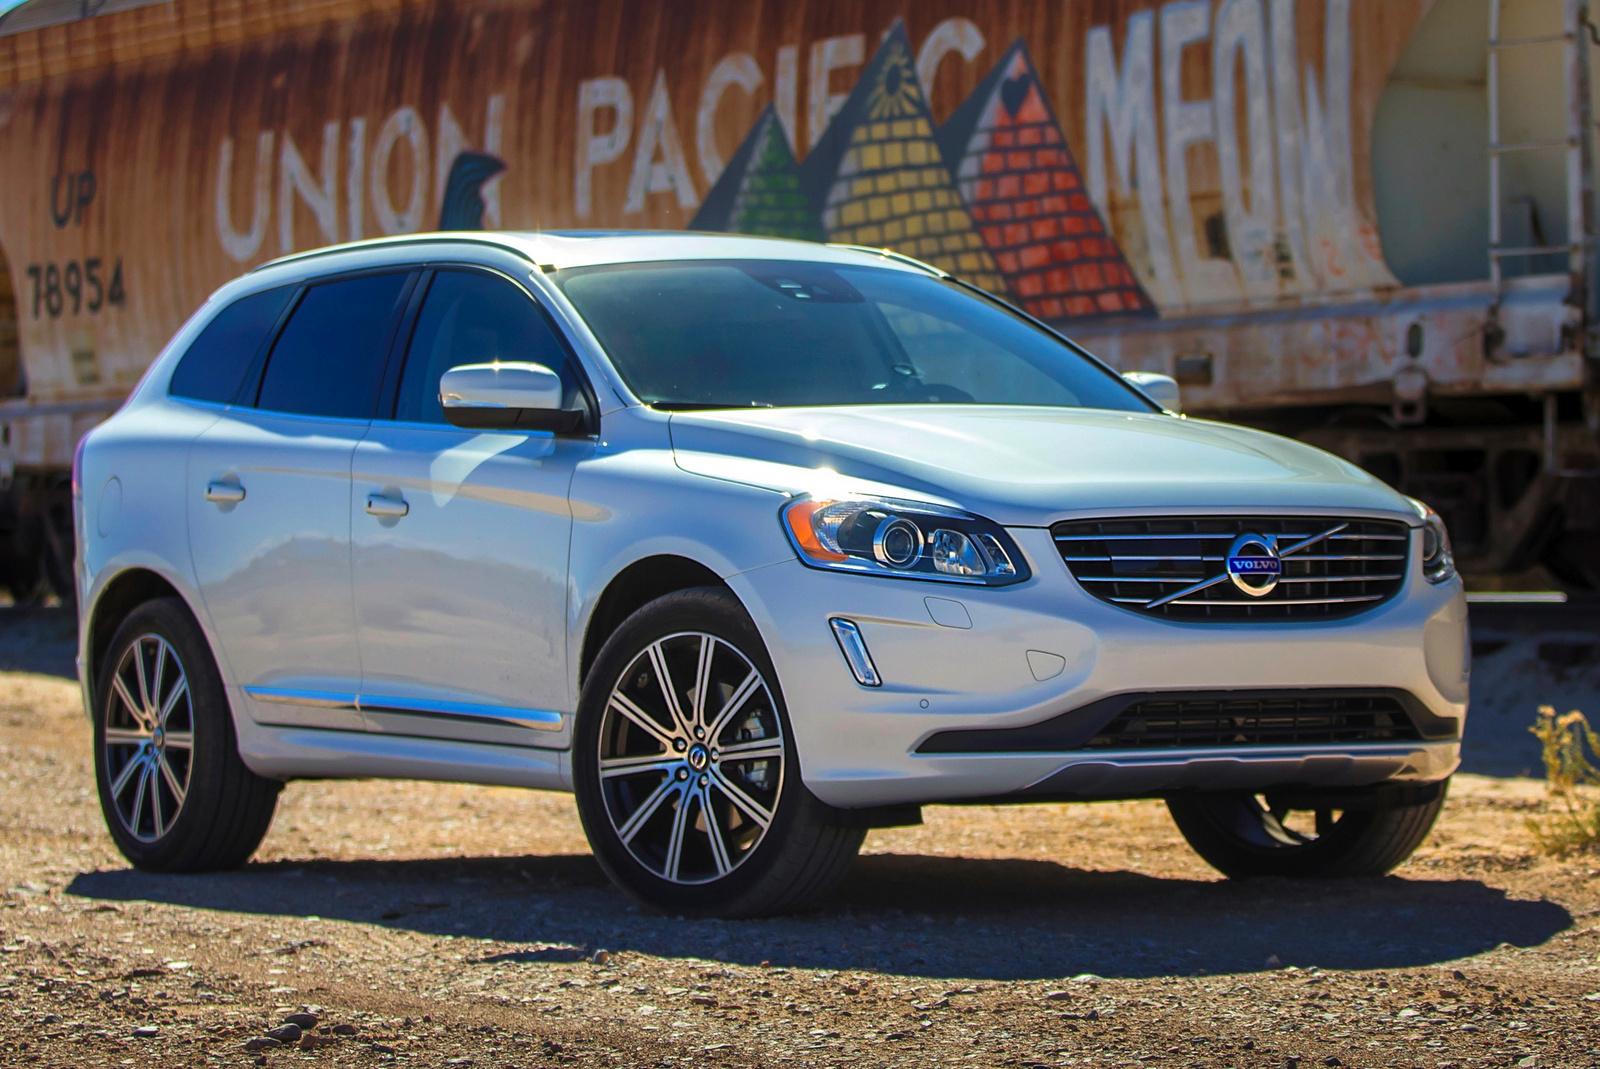 New 2015 / 2016 Volvo XC60 For Sale - CarGurus